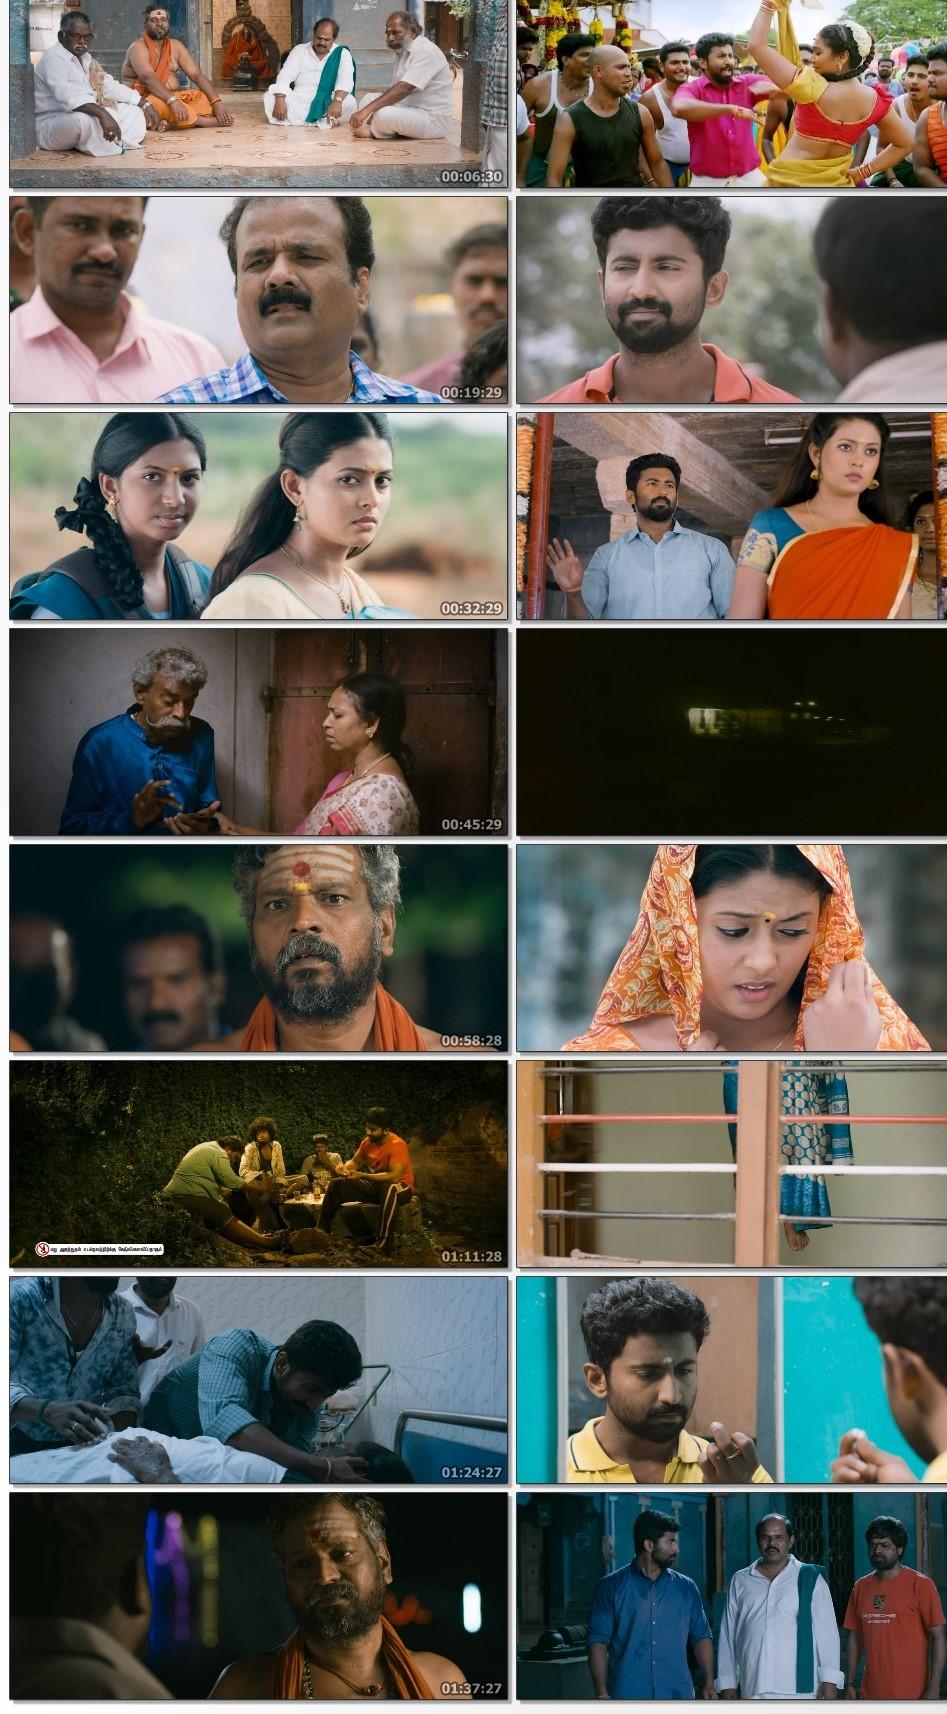 Namma-Oorukku-Ennadhan-Achu-2021-www-9kmovies-school-Tamil-TRUE-HDRip-720p-1-2-GB-ESub-mkv-thumbs6d5